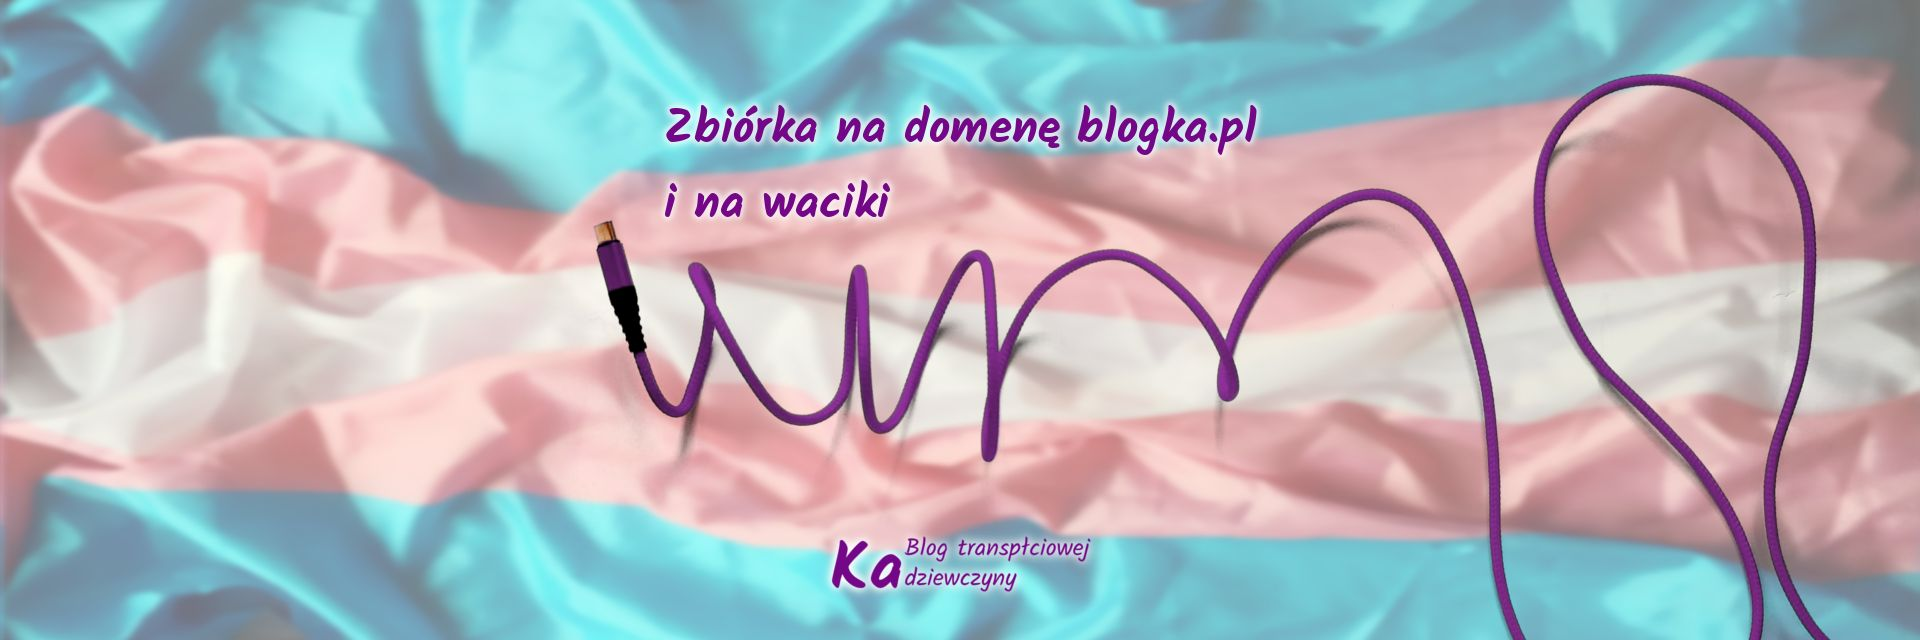 Zbiórka na domenę bloga - blogka.pl i na waciki, [fioletowy spiralnie zwinięty kabel na tle flagi transgender]